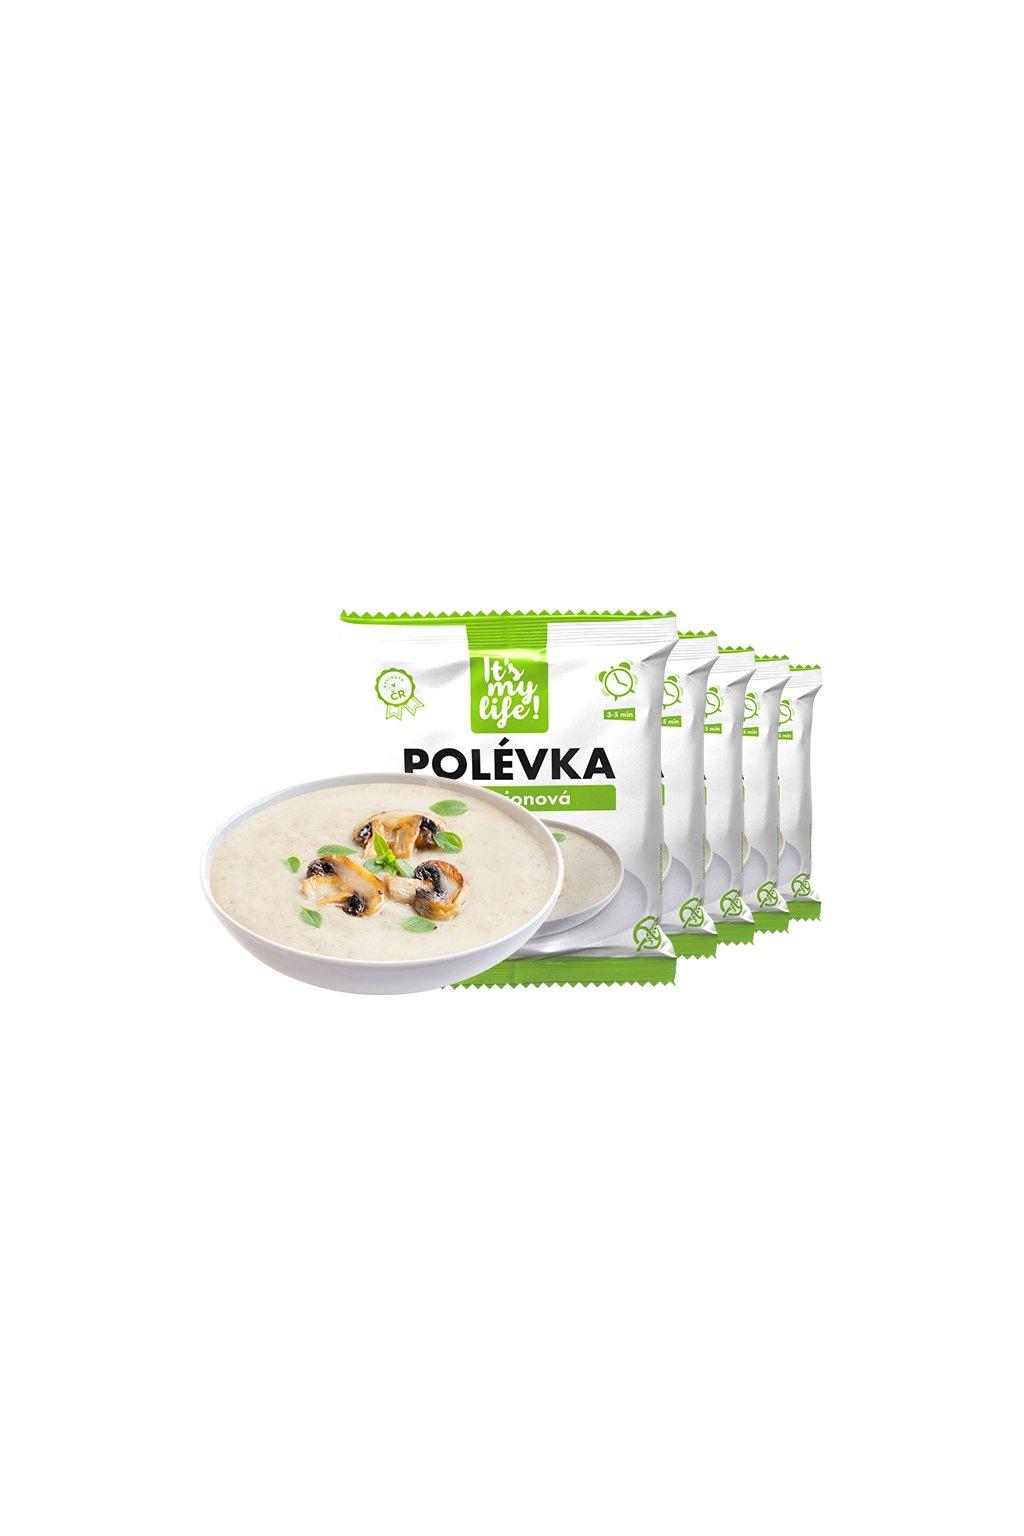 It's my life! Proteinová polévka žampionová 200g (1 porce)